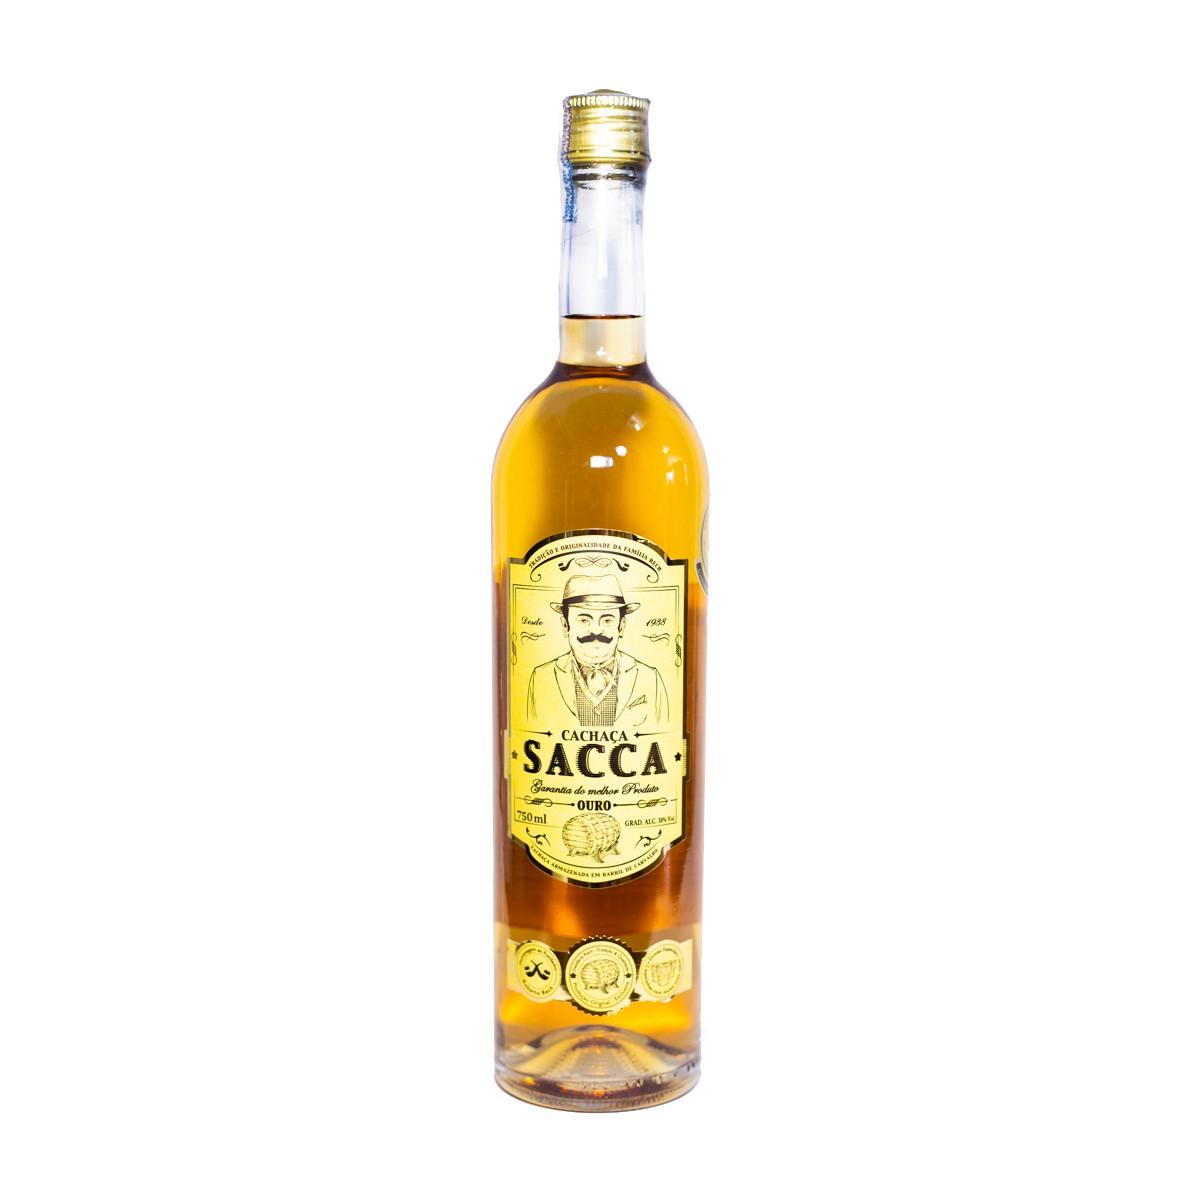 Cachaça Sacca Ouro - Rech - 750 ml